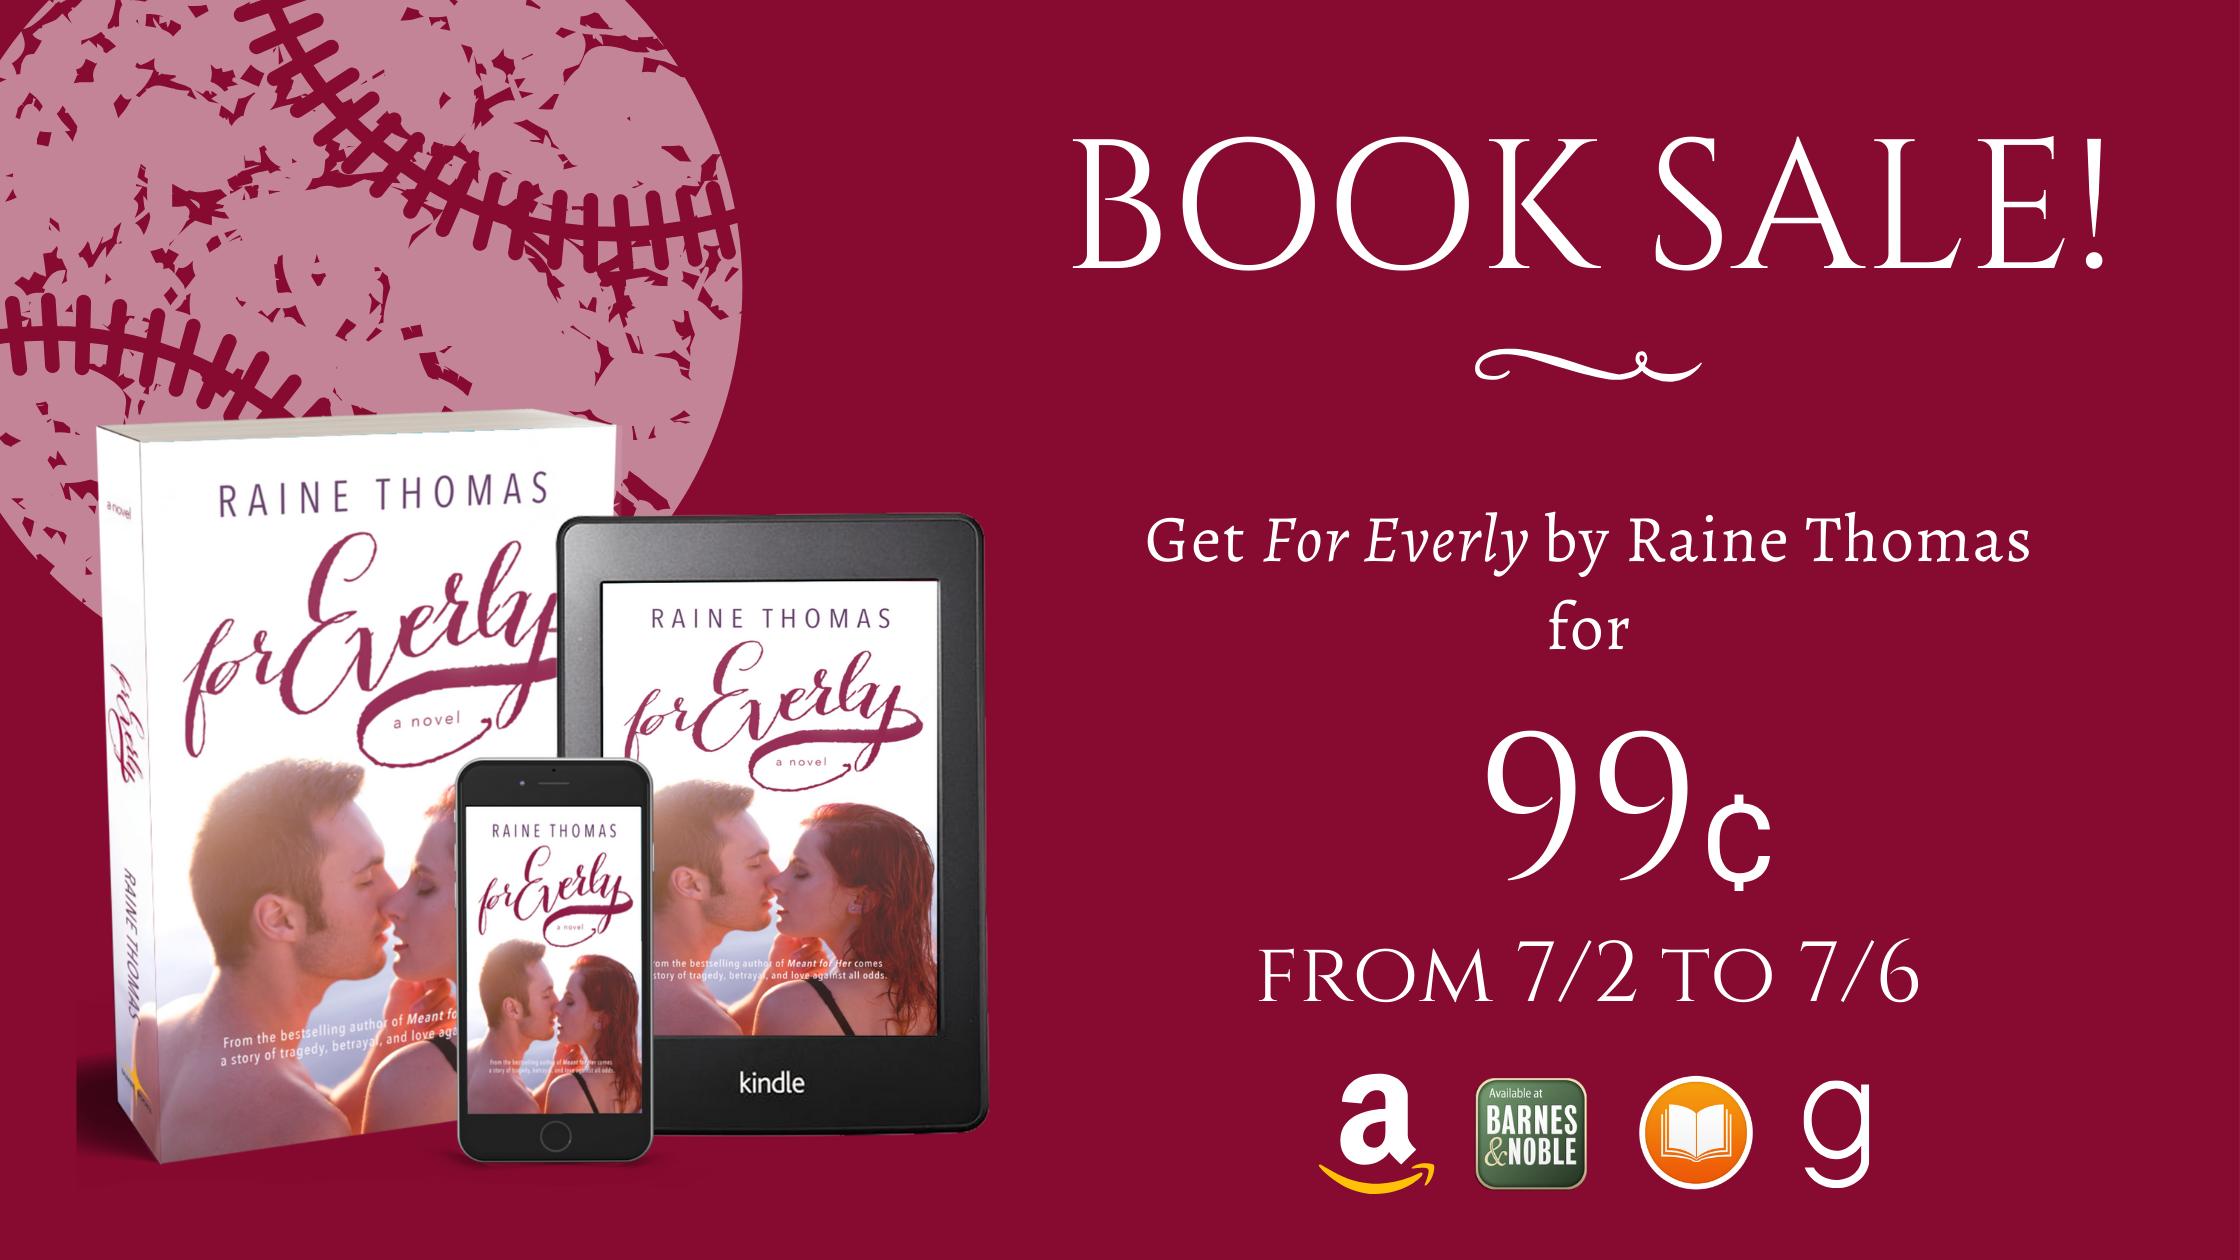 Book Sale - For Everly - Raine Thomas